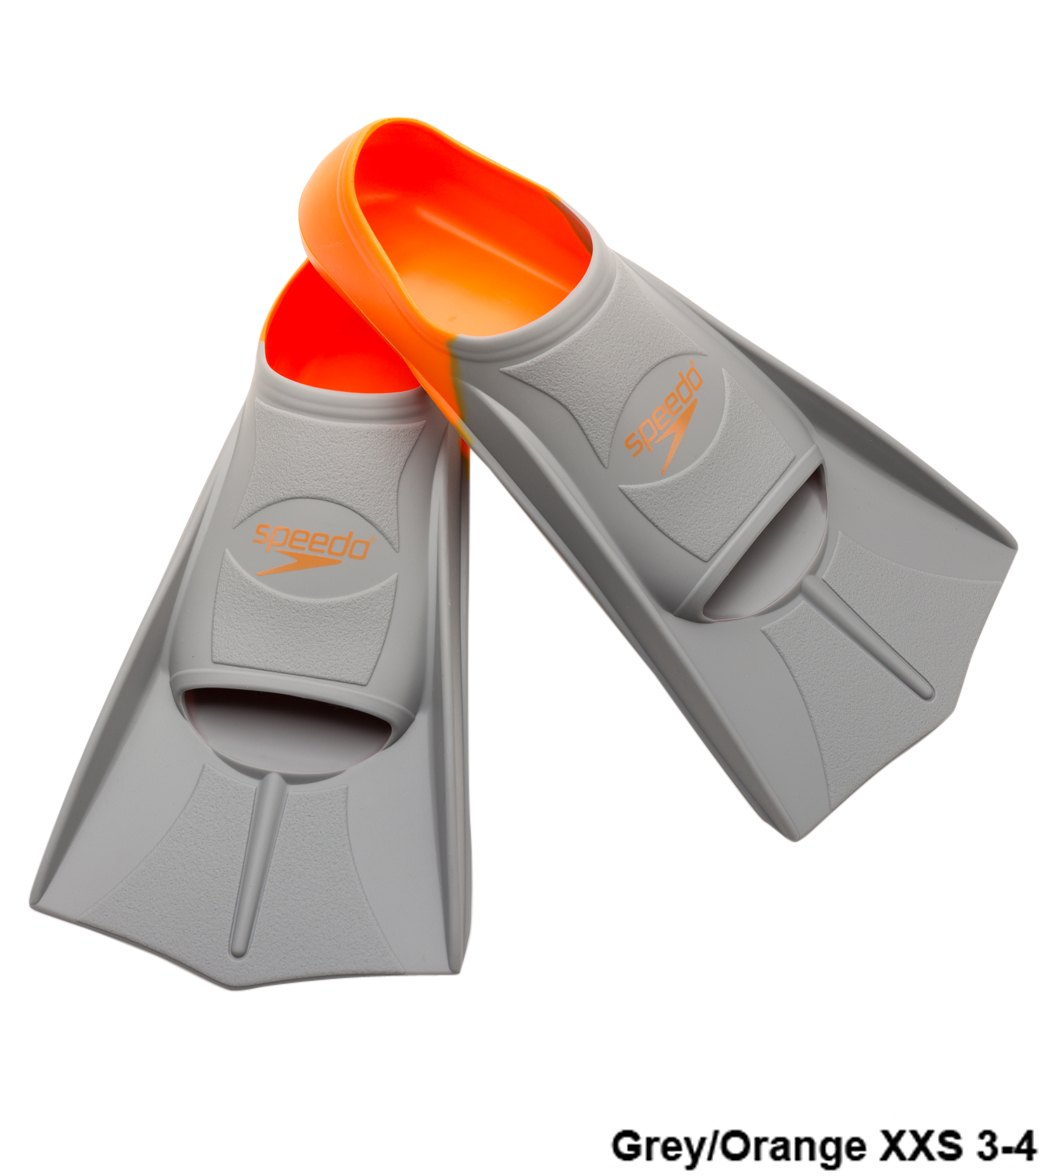 Speedo Short Blade Training Swim Fins